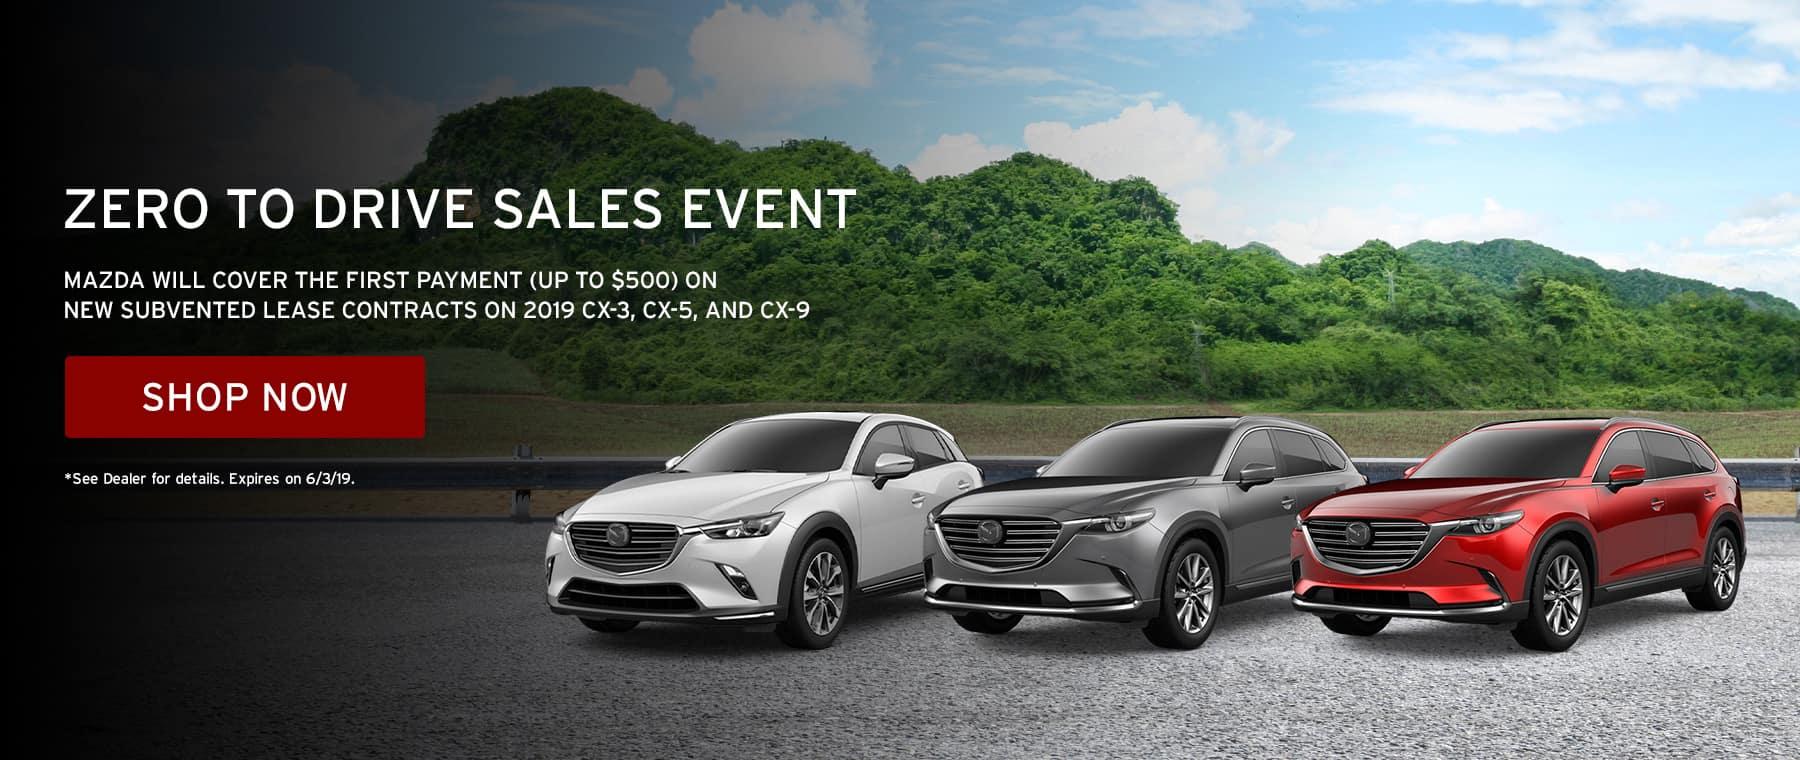 Zero to Drive Sales Event